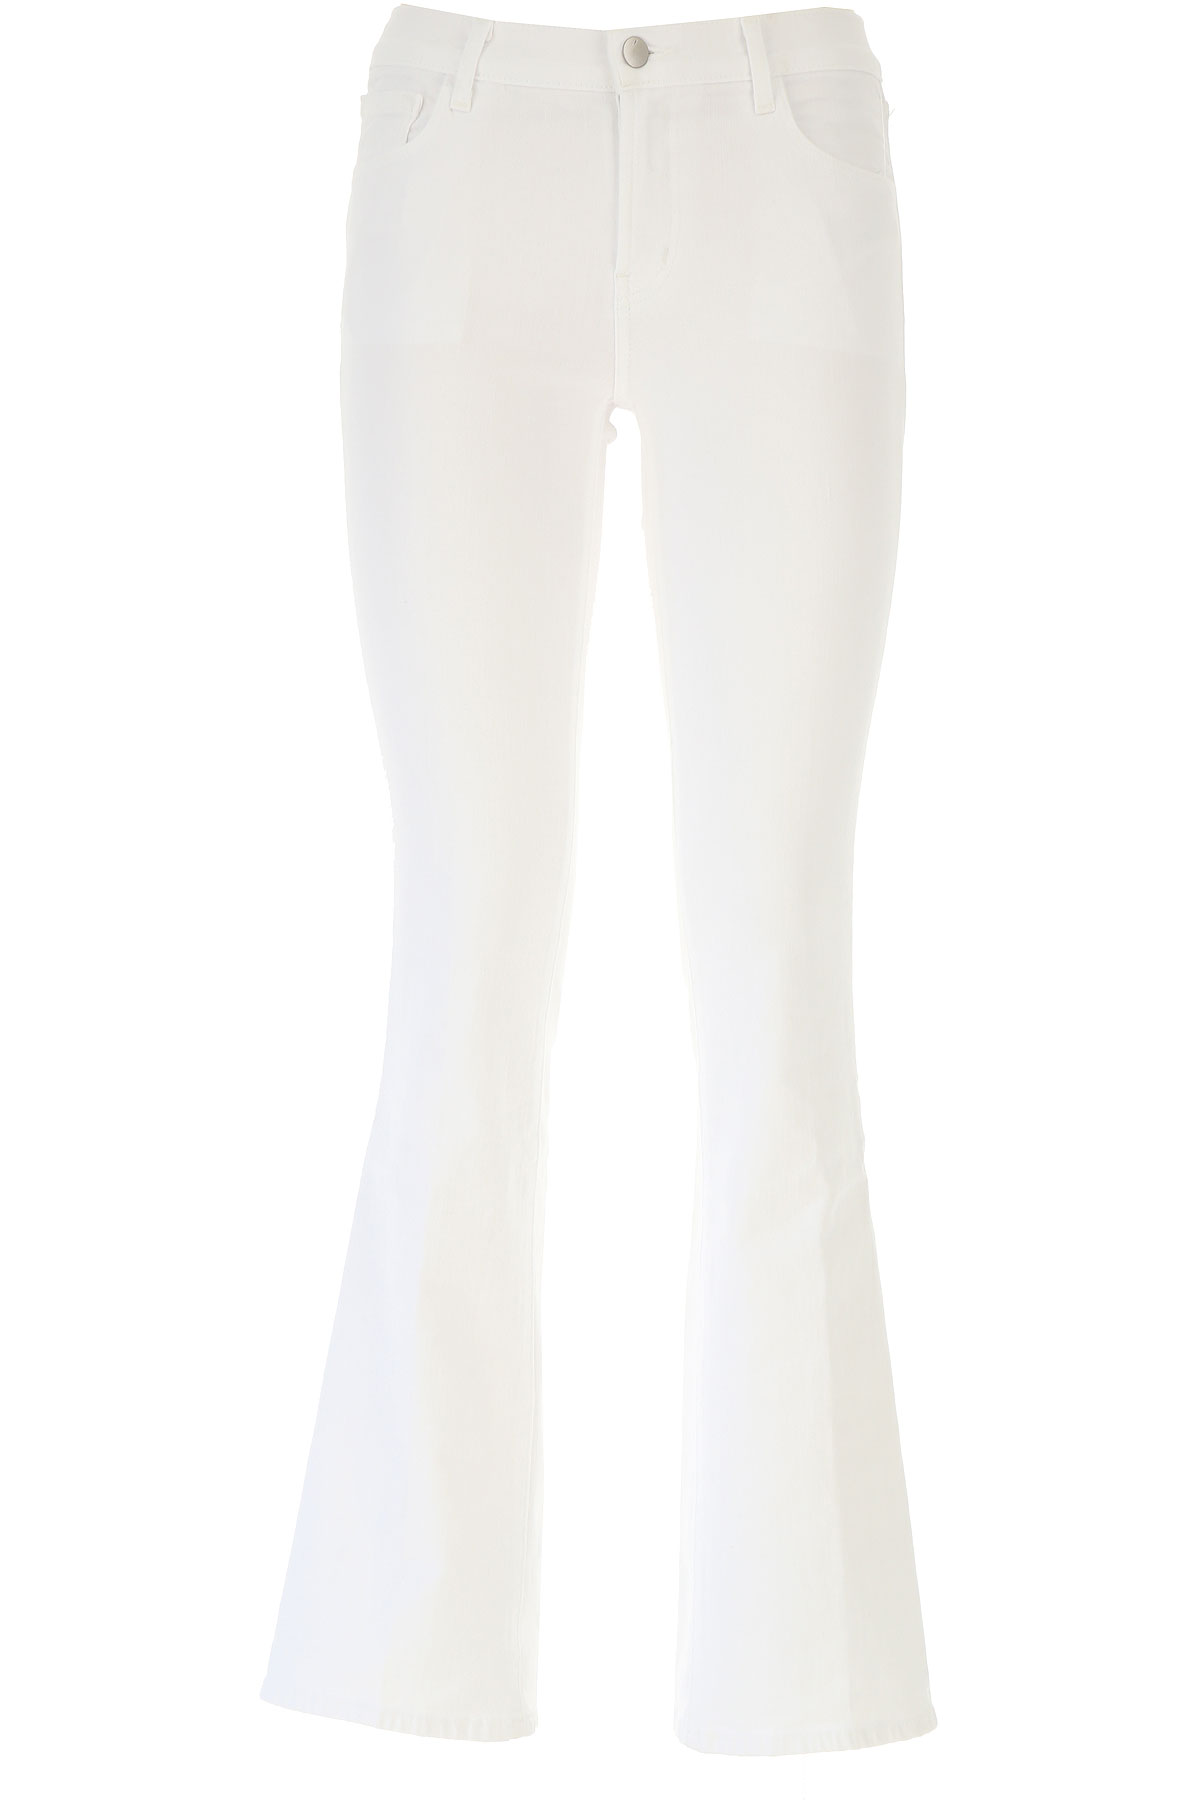 J Brand Jeans On Sale, White, Cotton, 2019, 25 26 27 30